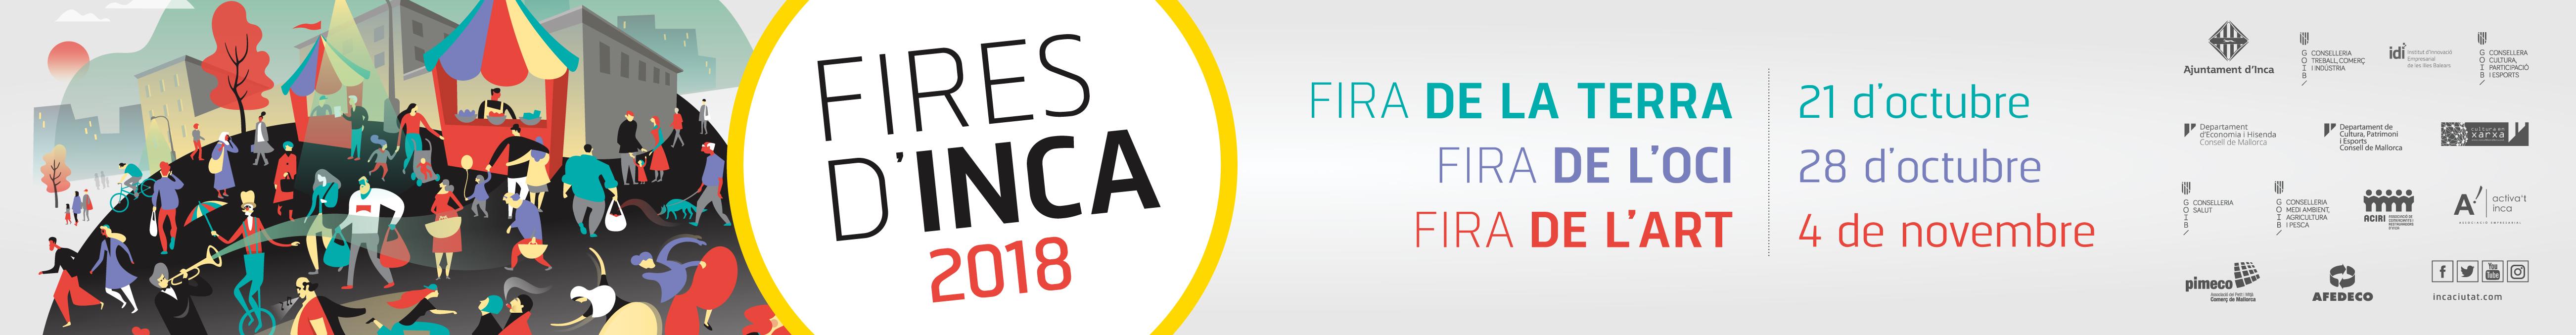 www.dijousbo.es | 15 novembre 2018 | Dijous Bo Inca logo